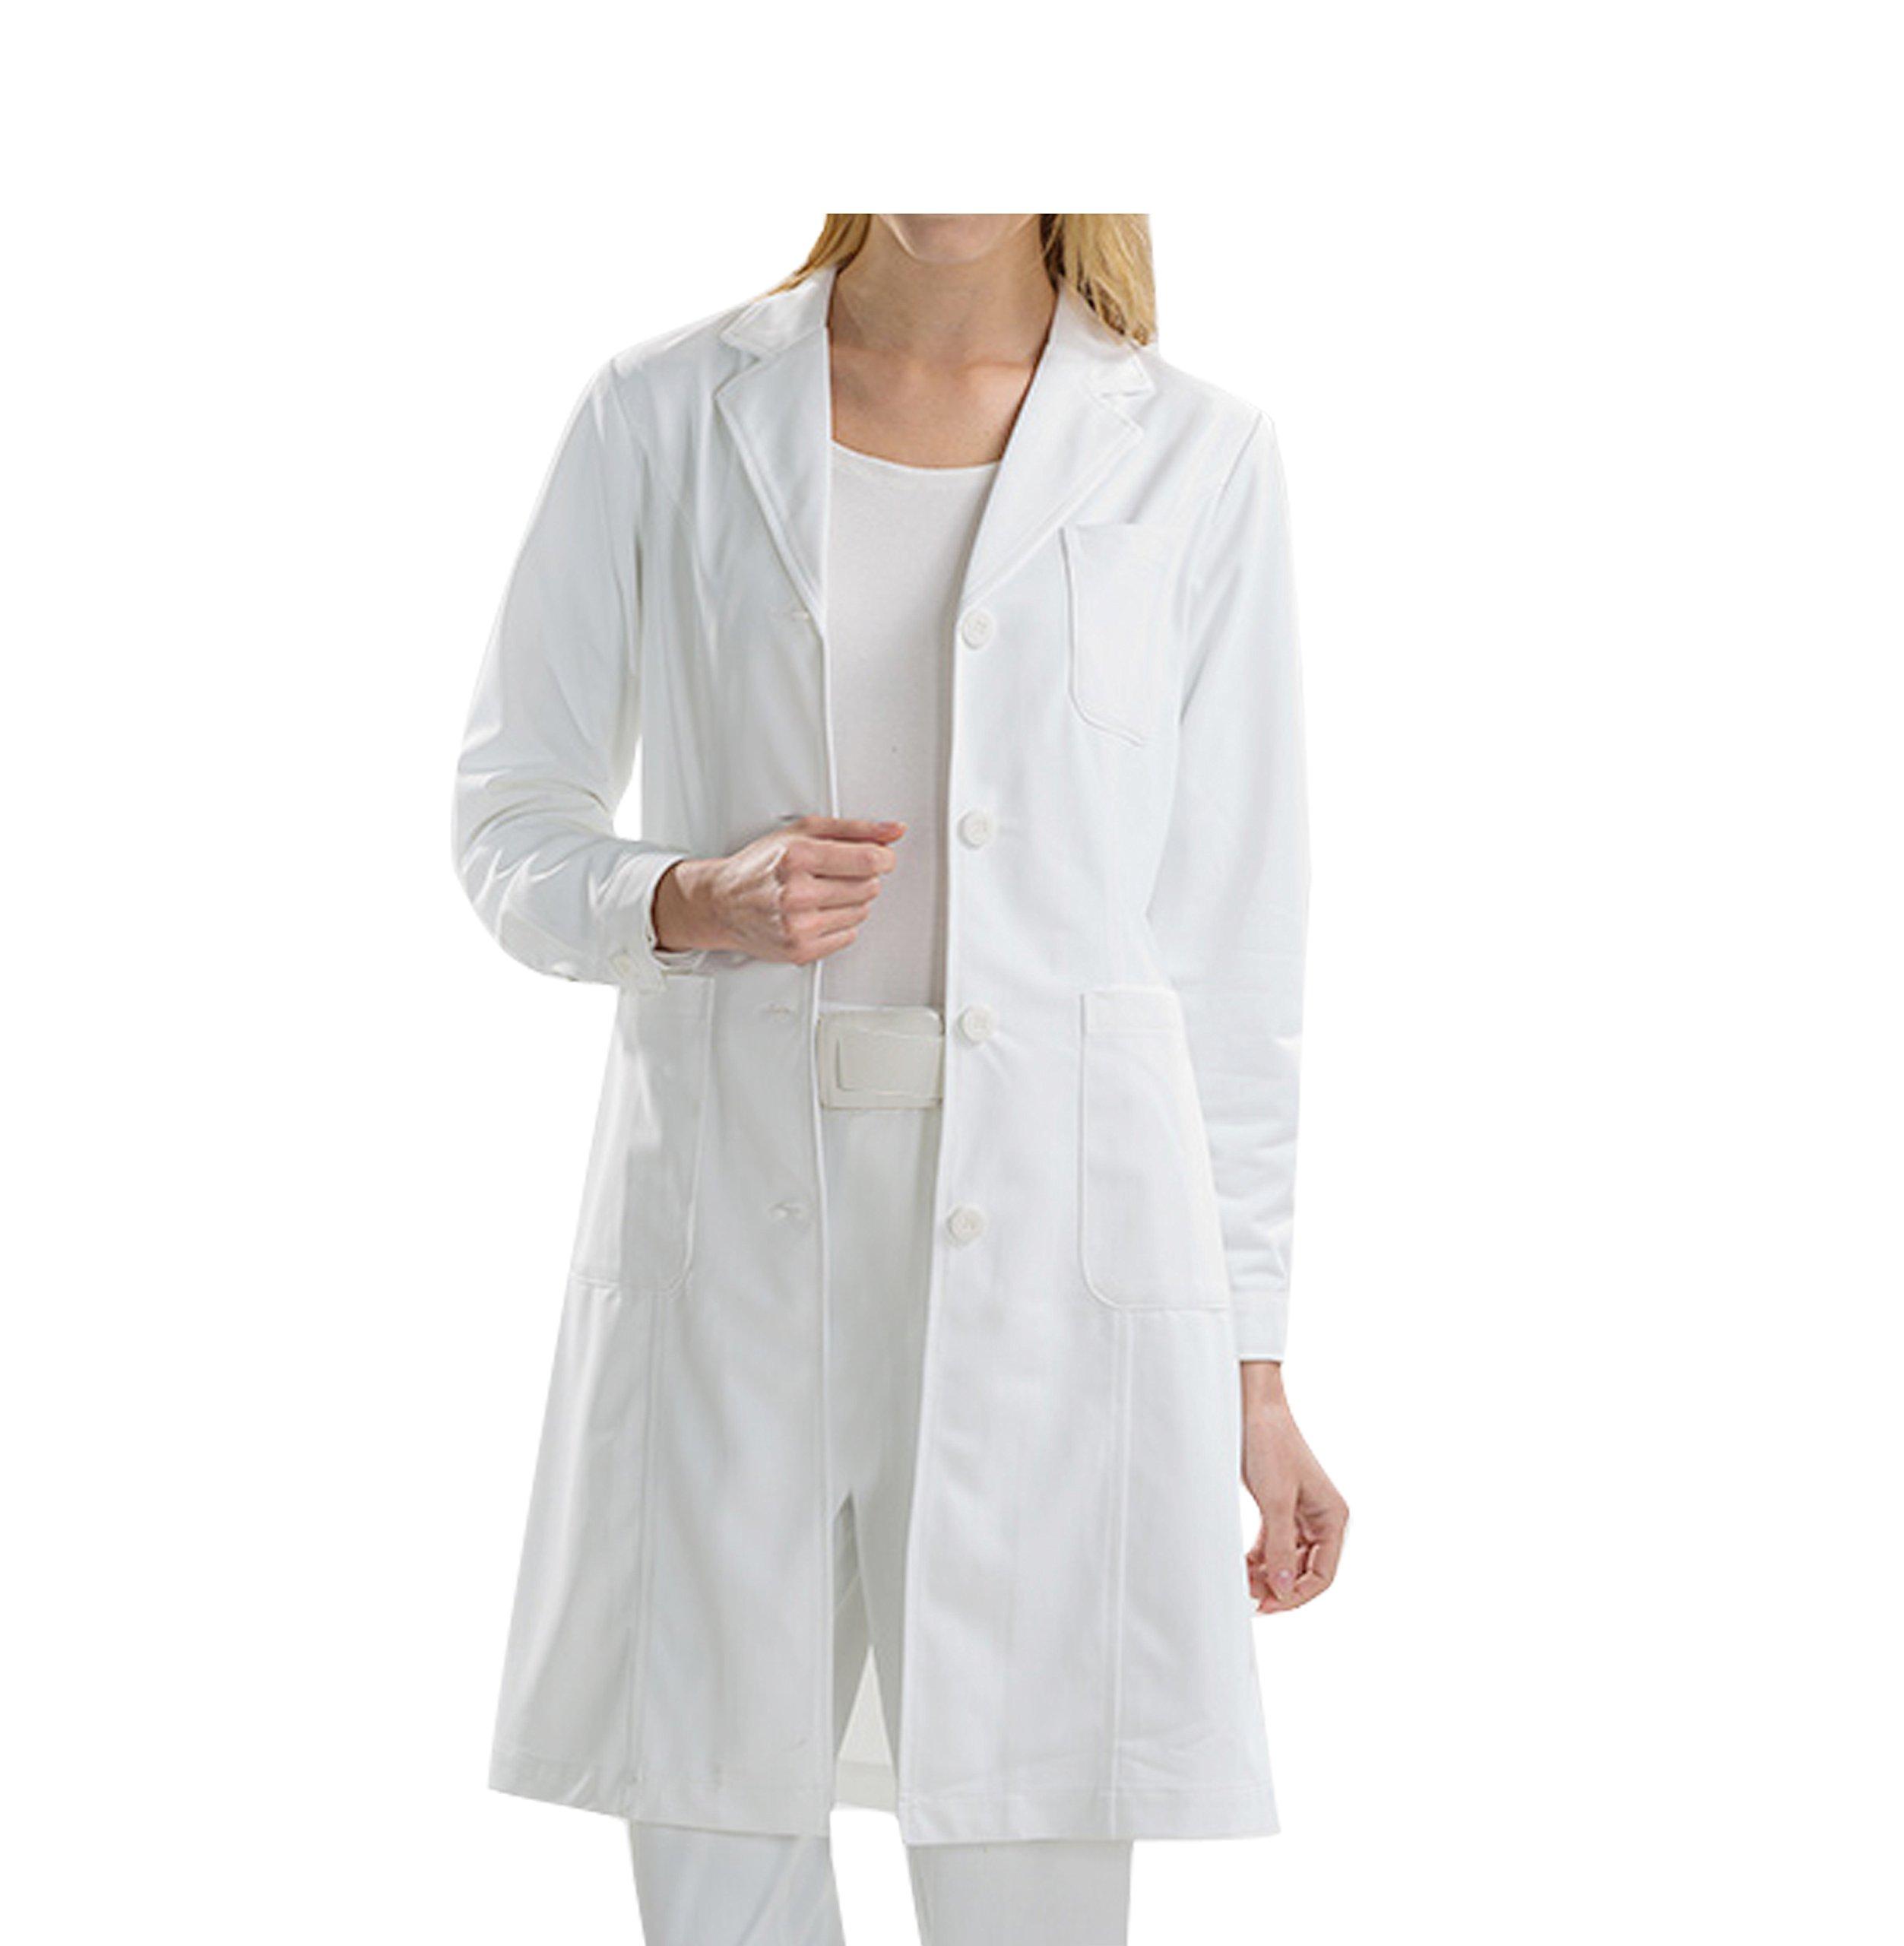 BSTT Women Lab Coat White Medical Uniforms Scrubs-2018 New Improvement Buttoned Sleeves Thick XXL